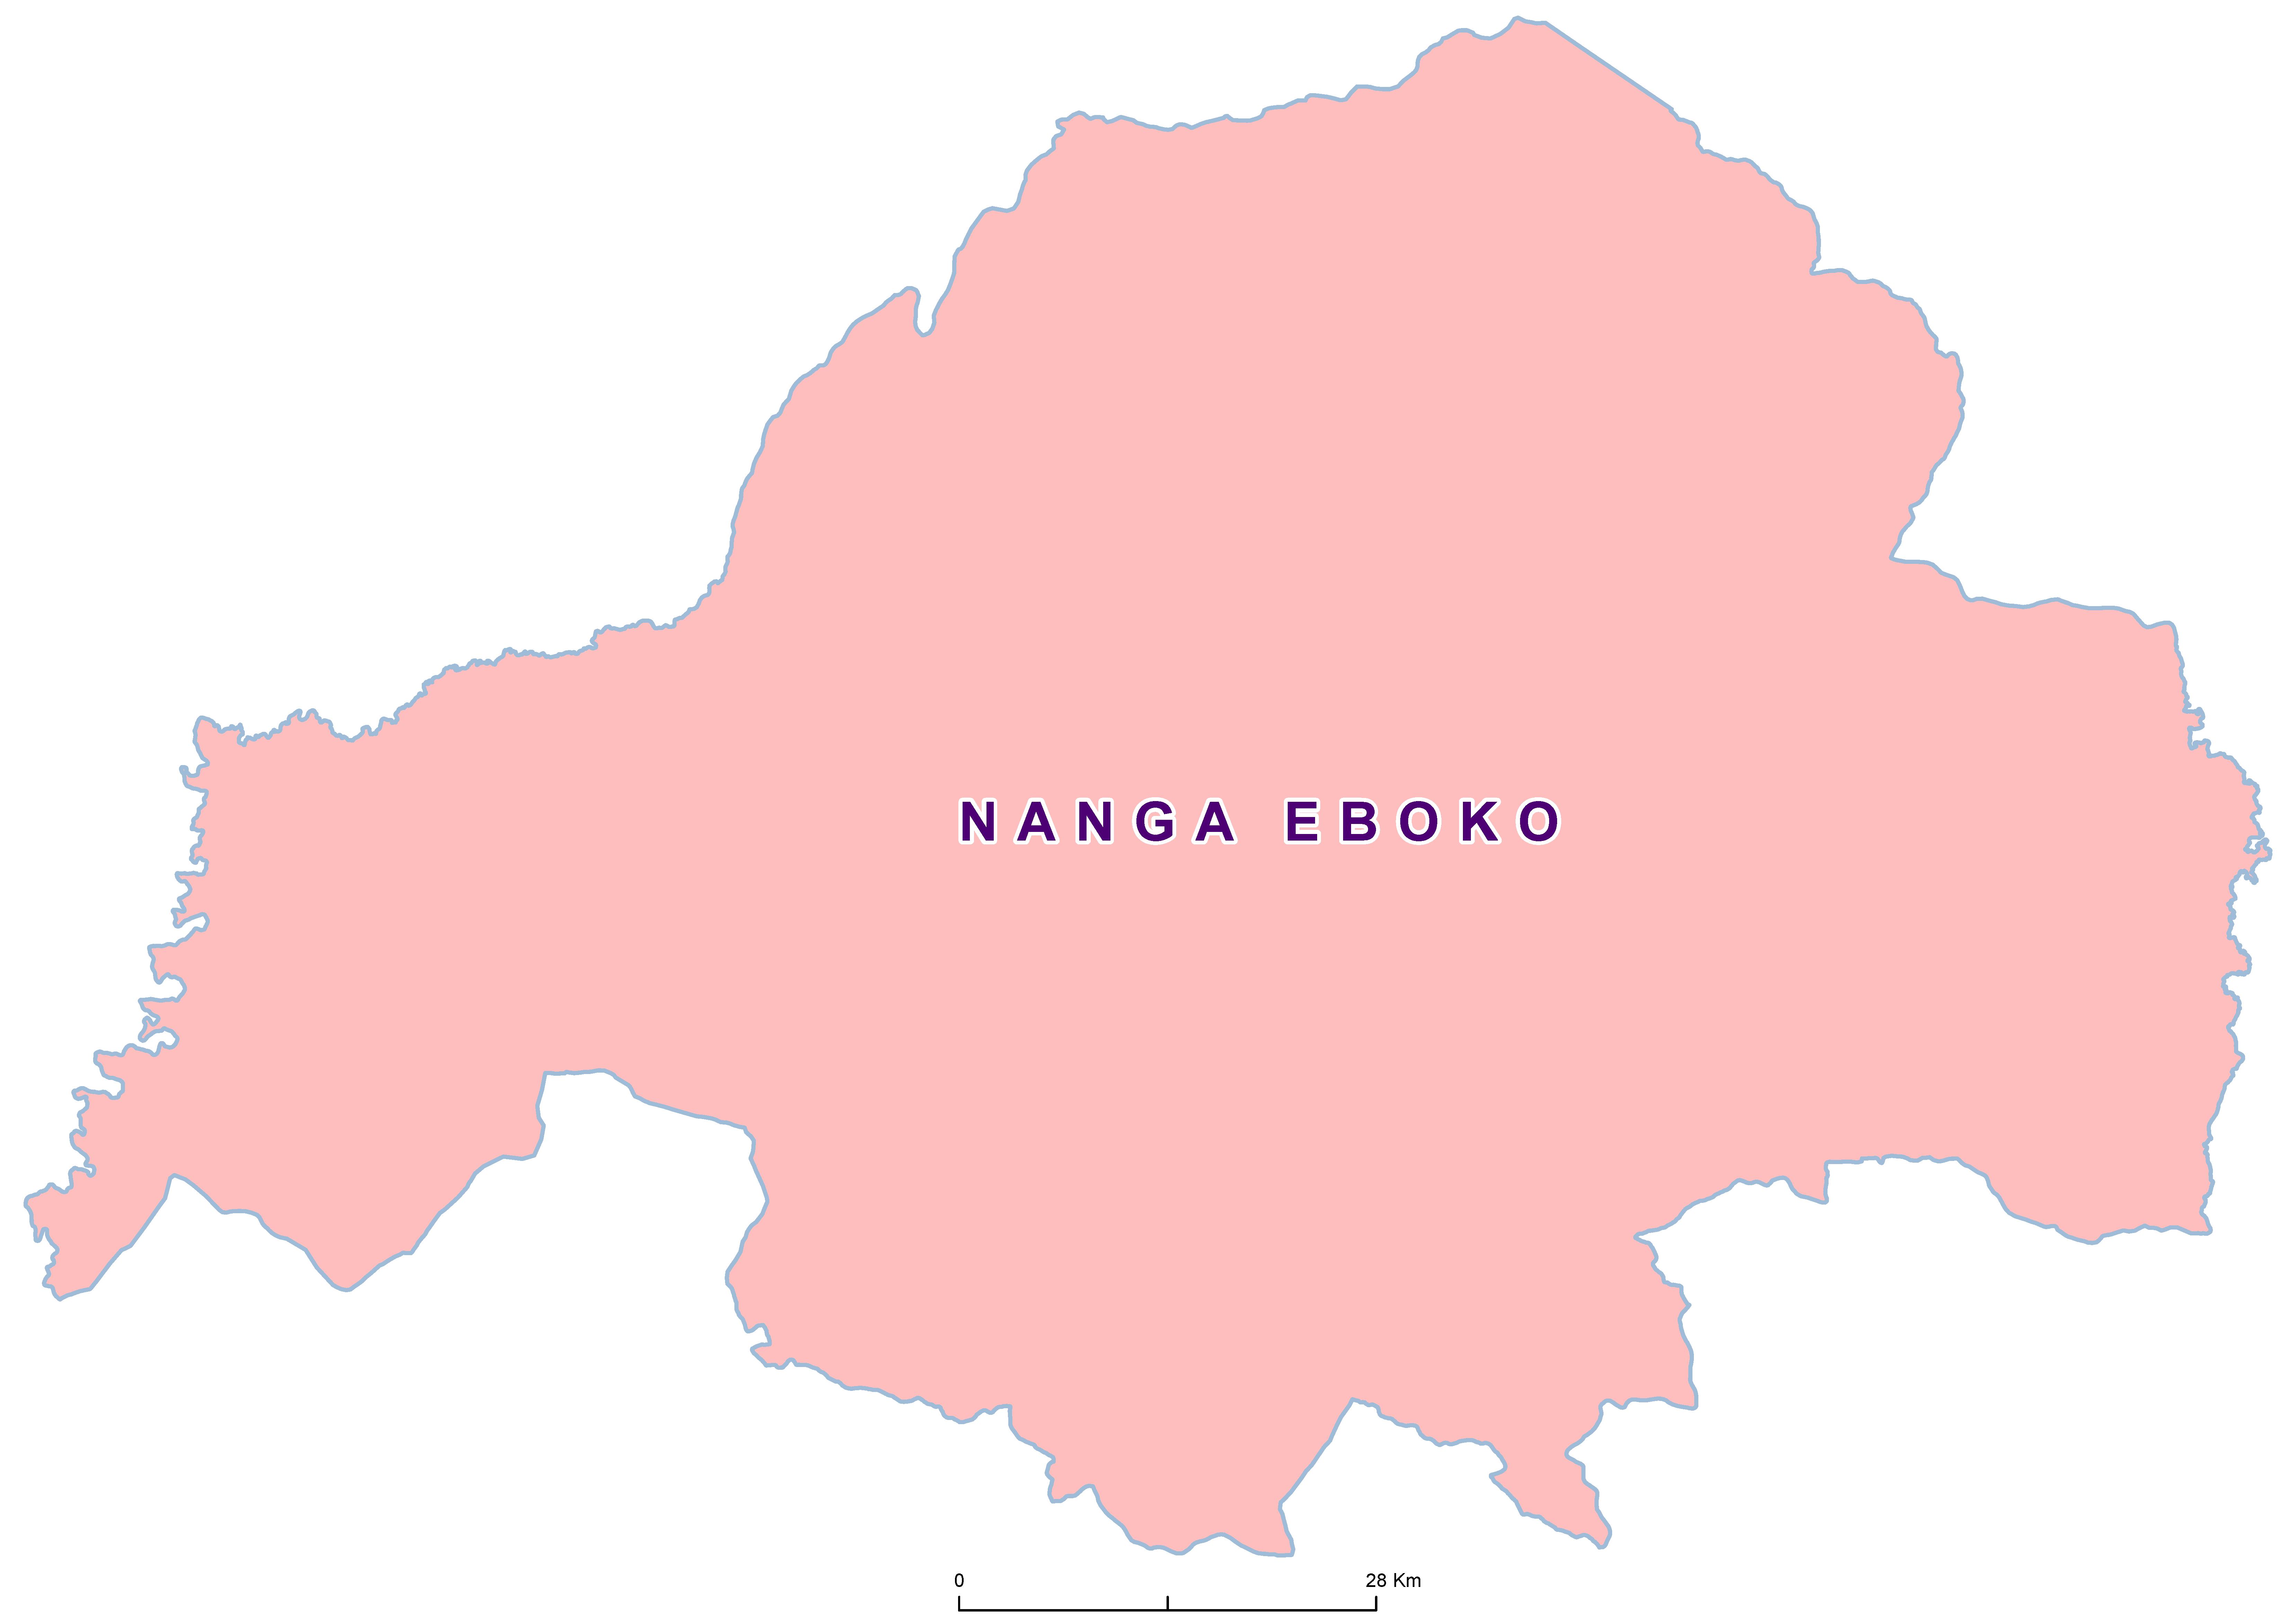 Nanga eboko Max SCH 19850001